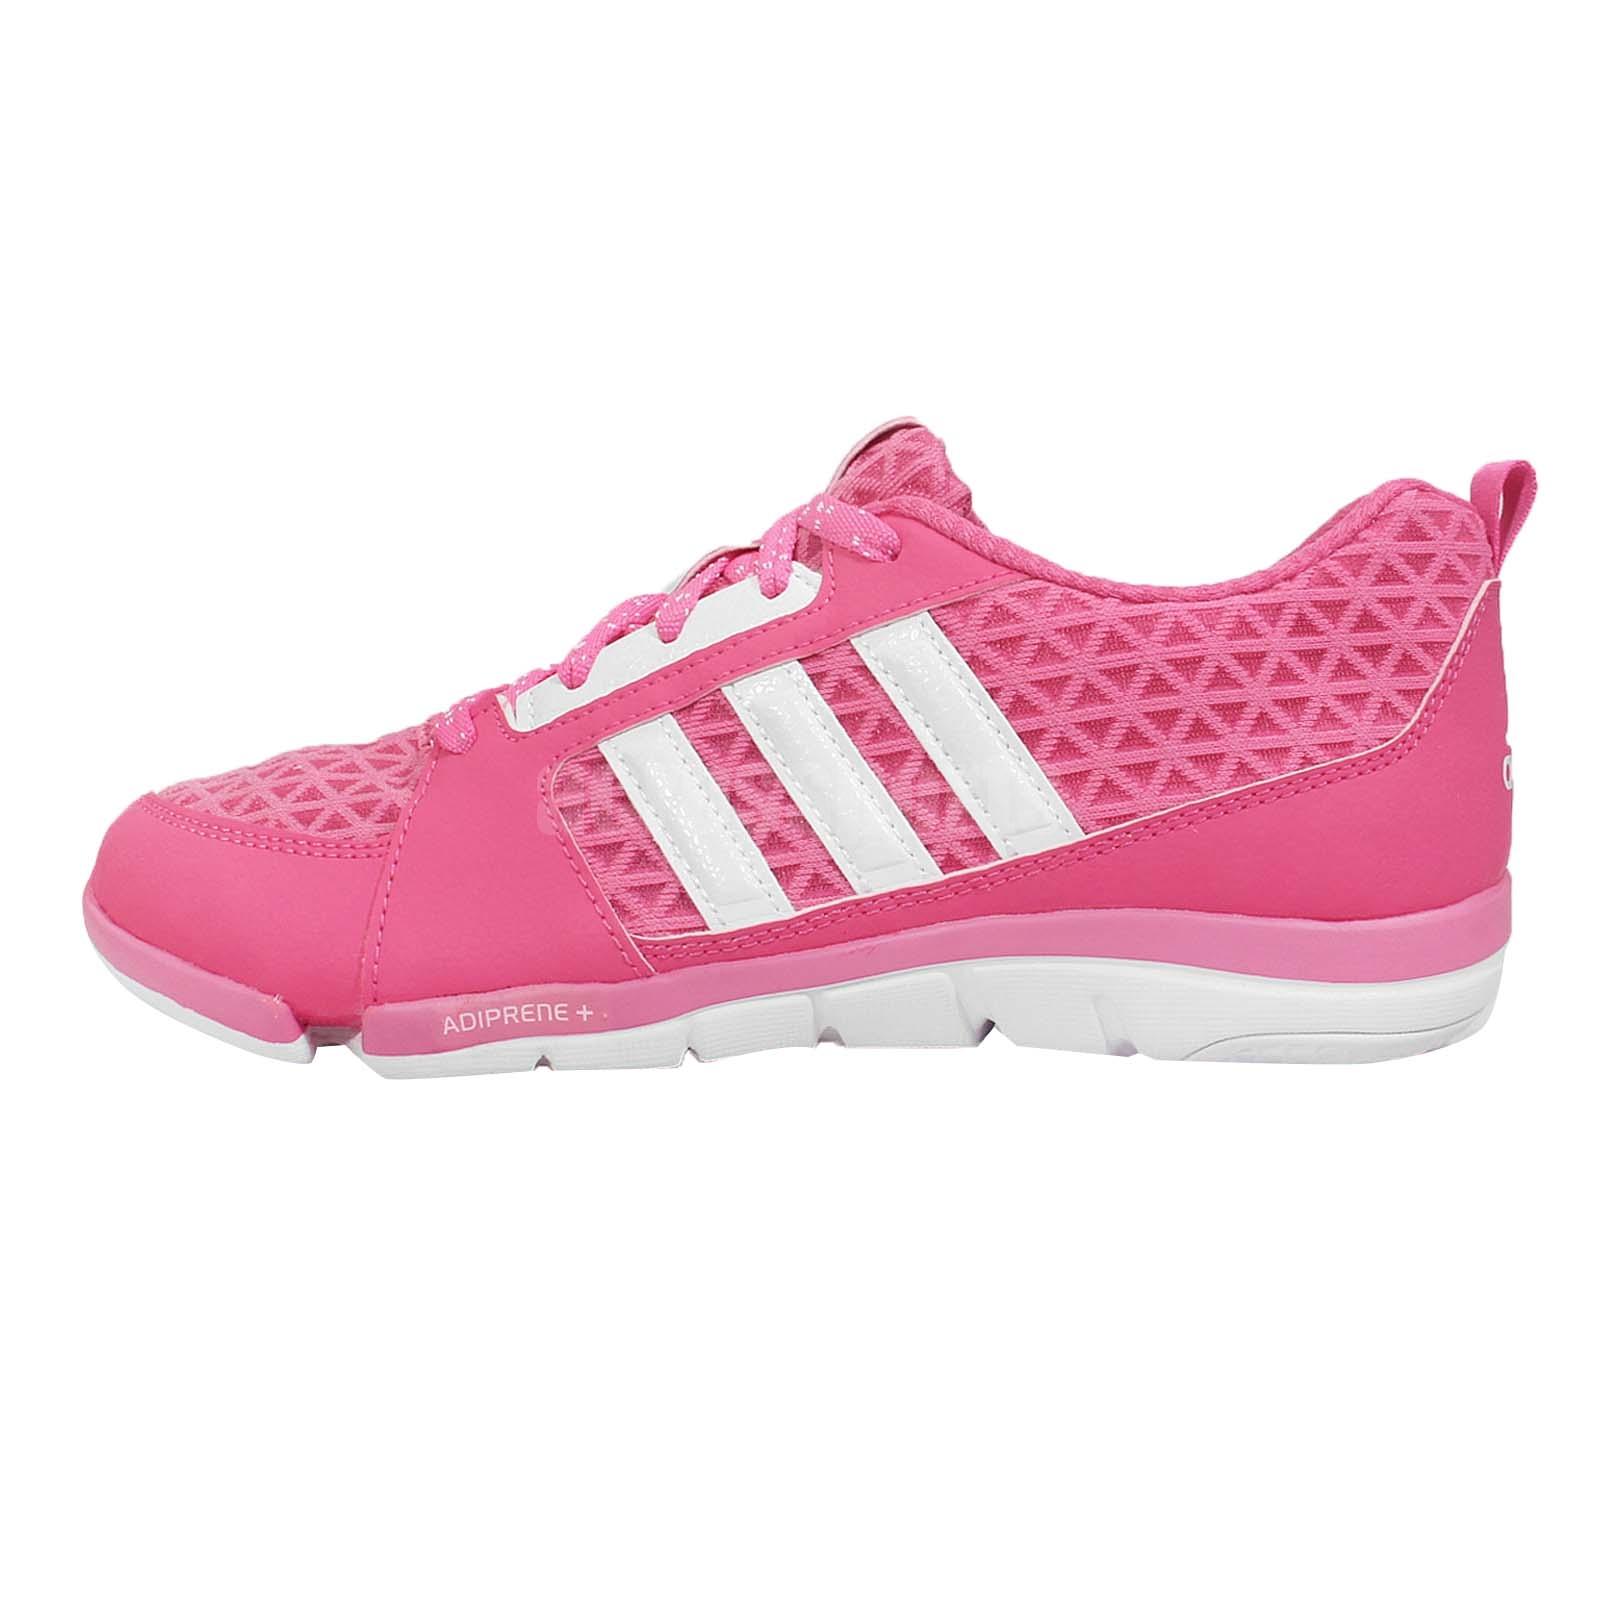 Cross Training Shoes Womens Amazon